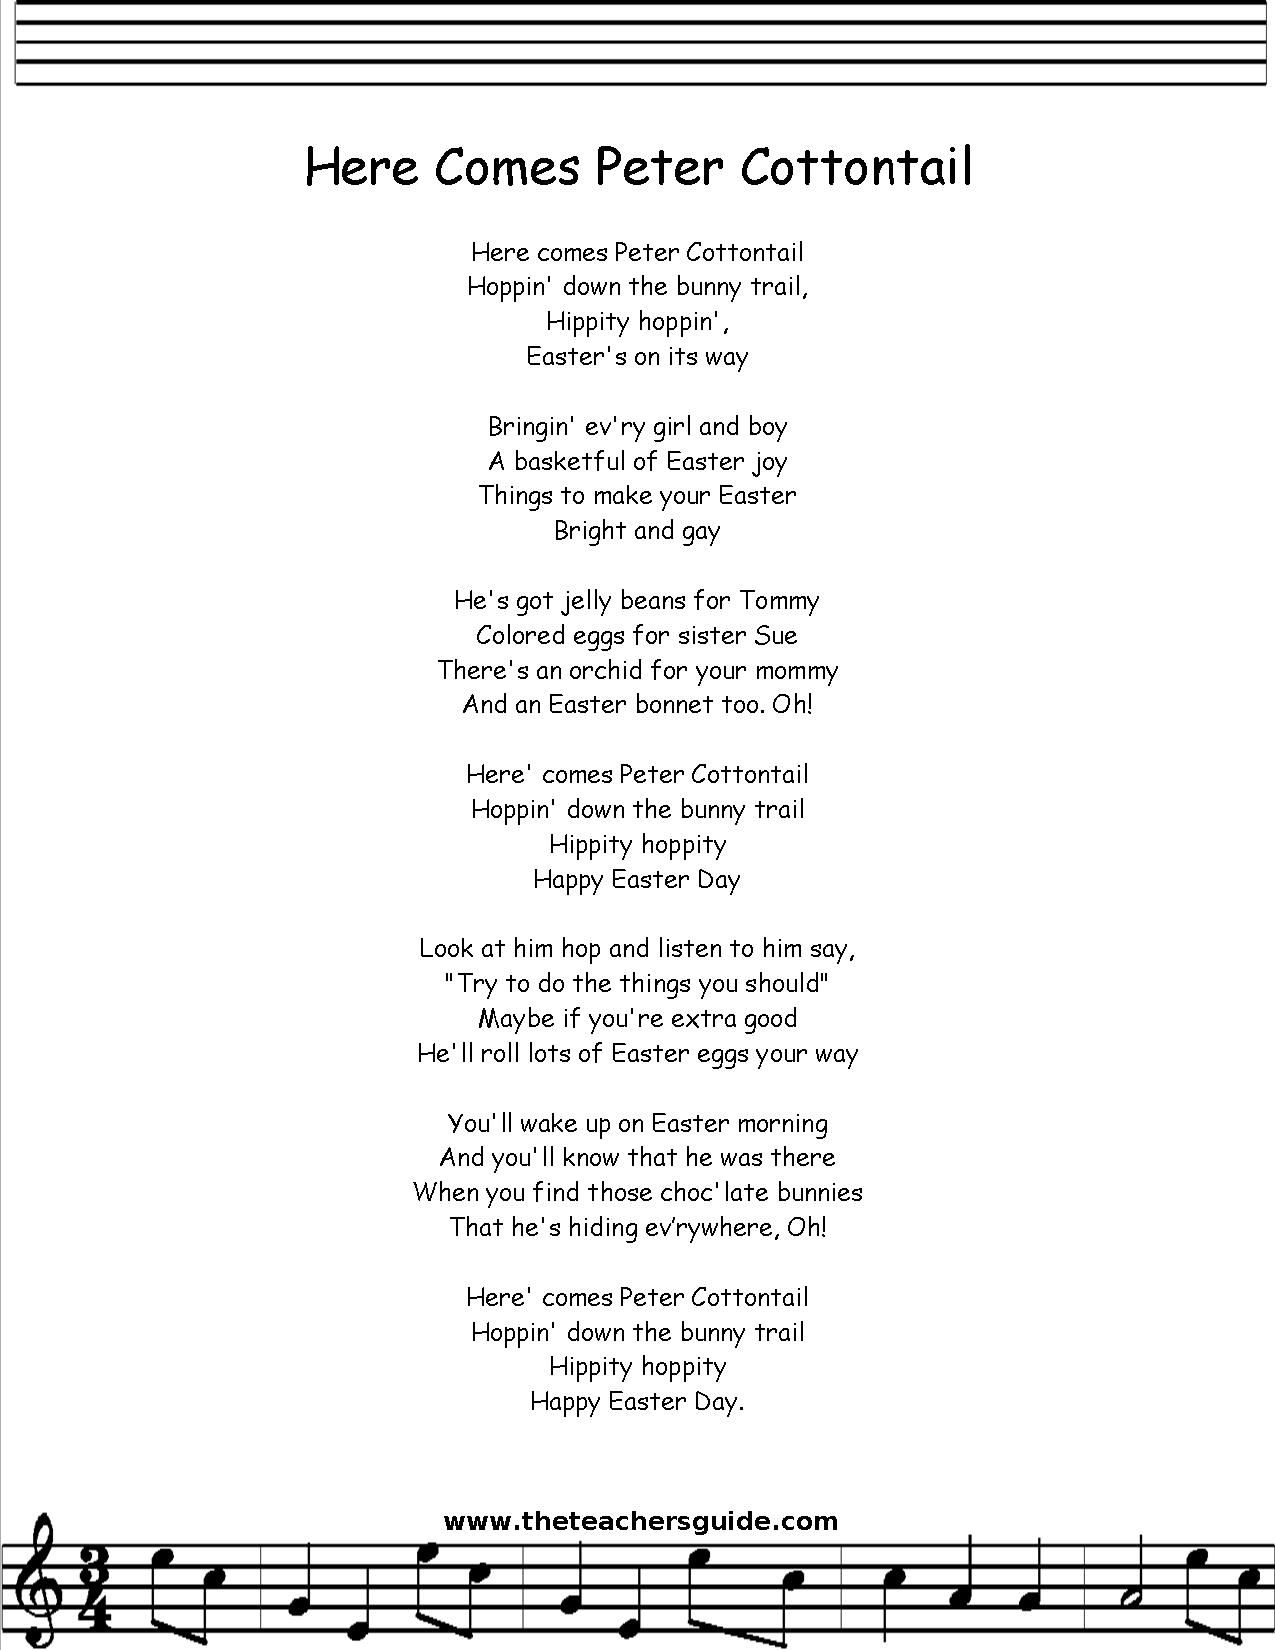 Peter Cottontail lyrics printout | Children's Poetry